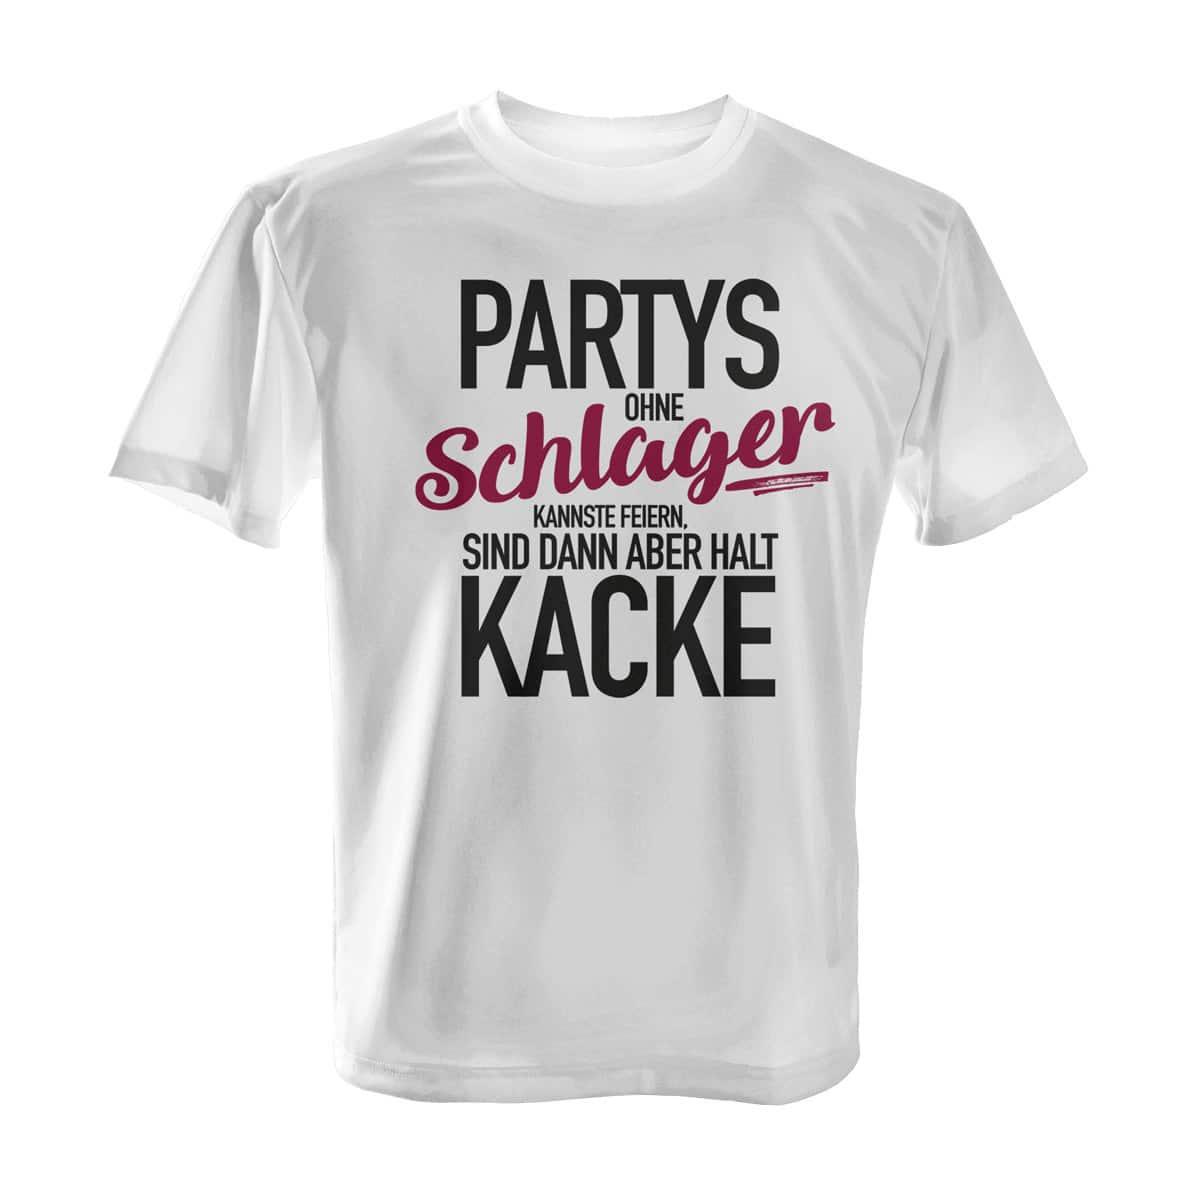 schlagerfans-tshirt-party-schlager-kacke-weiss